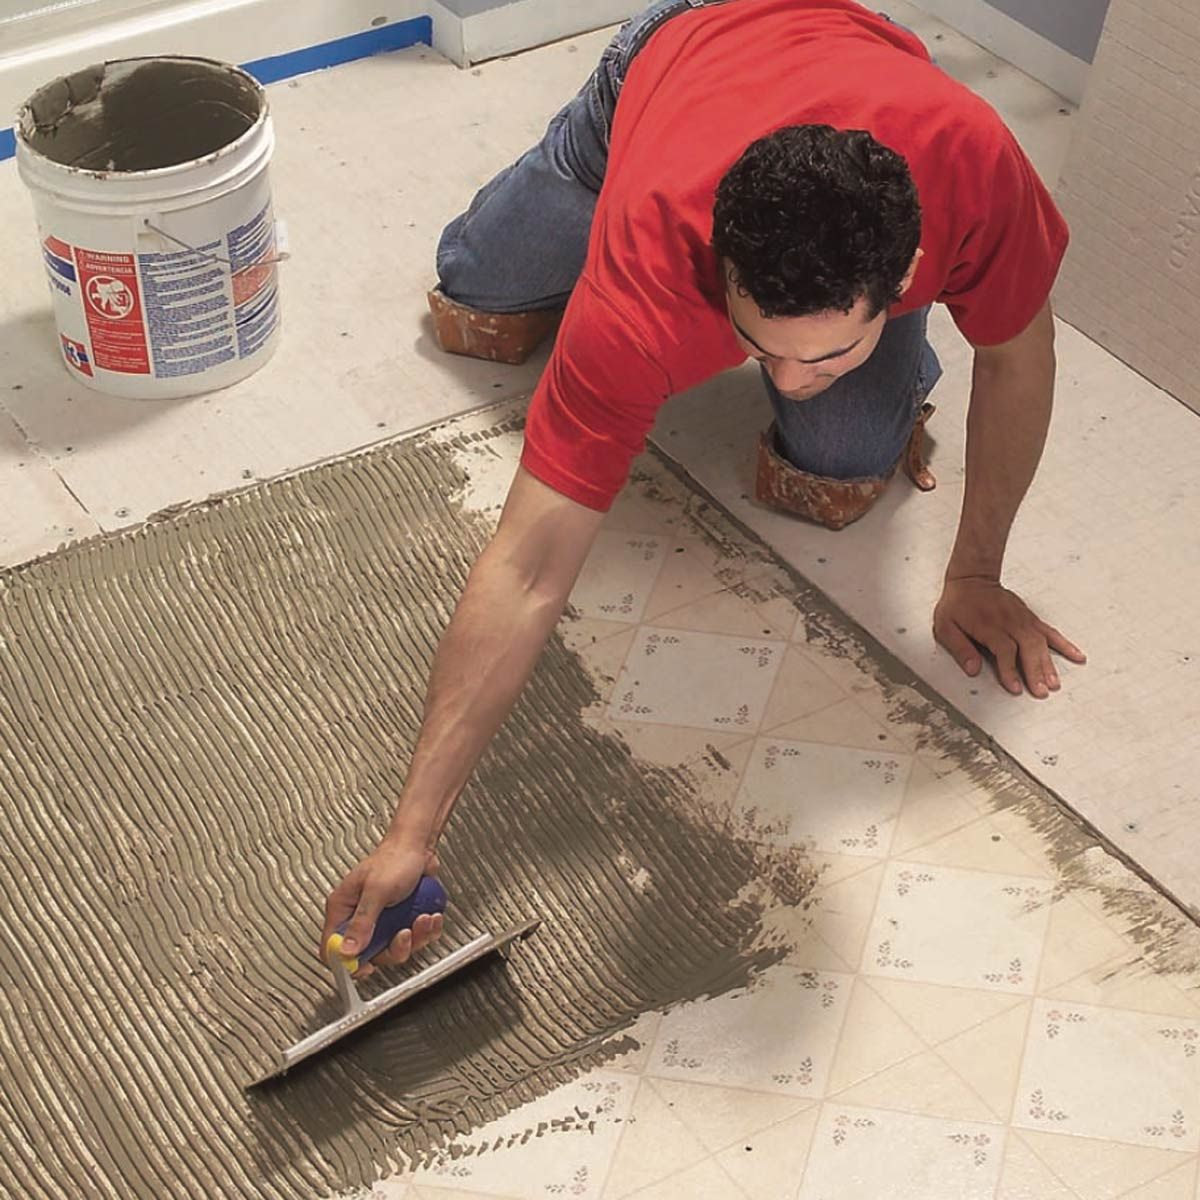 How To Lay Tile Install A Ceramic Tile Floor In The Bathroom The Family Handyman Ceramic Floor Tiles Ceramic Tile Bathrooms Tile Installation